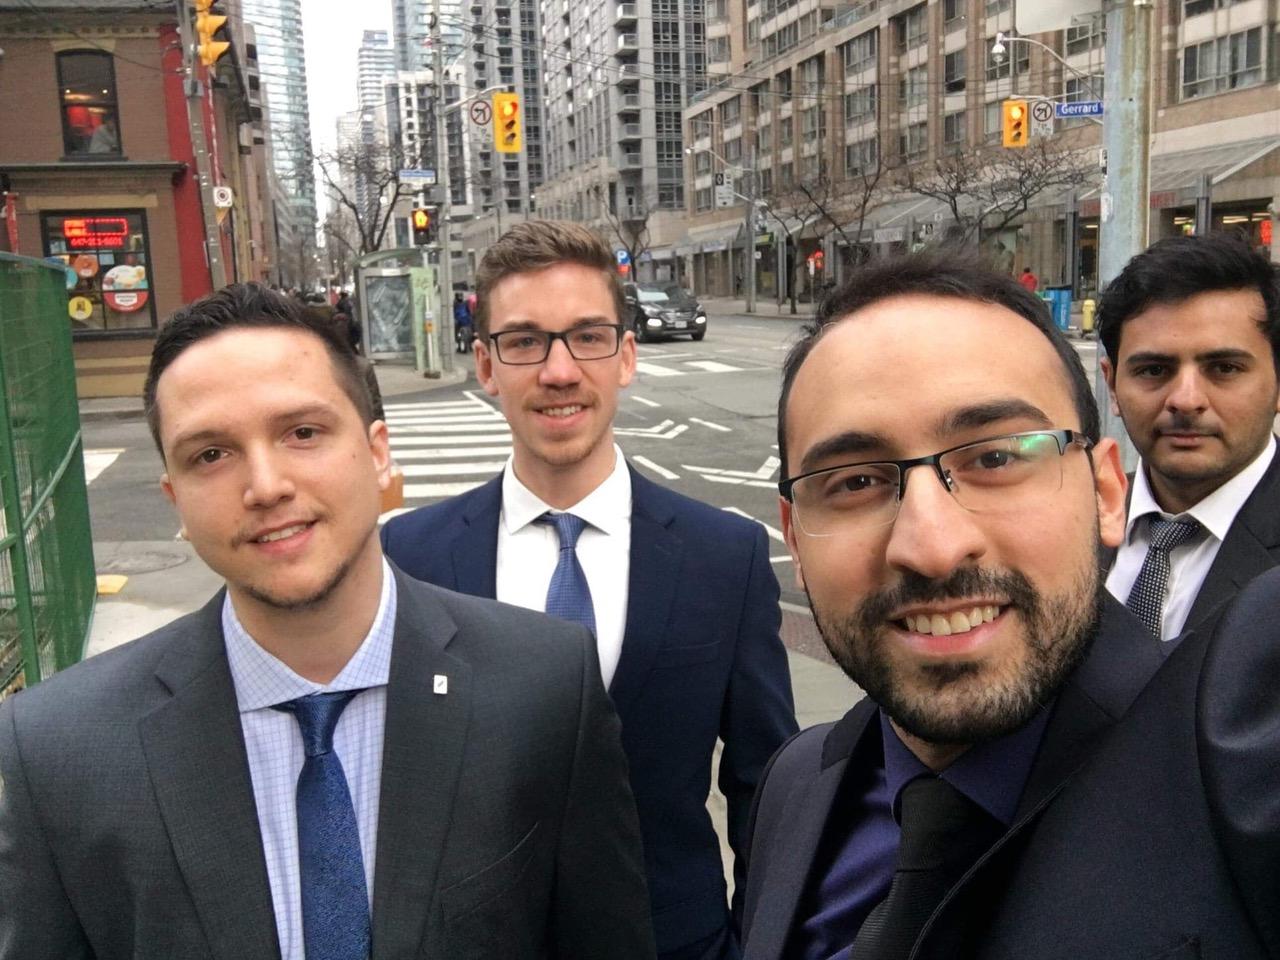 Blake and his team mates at the 2019 MBA Games